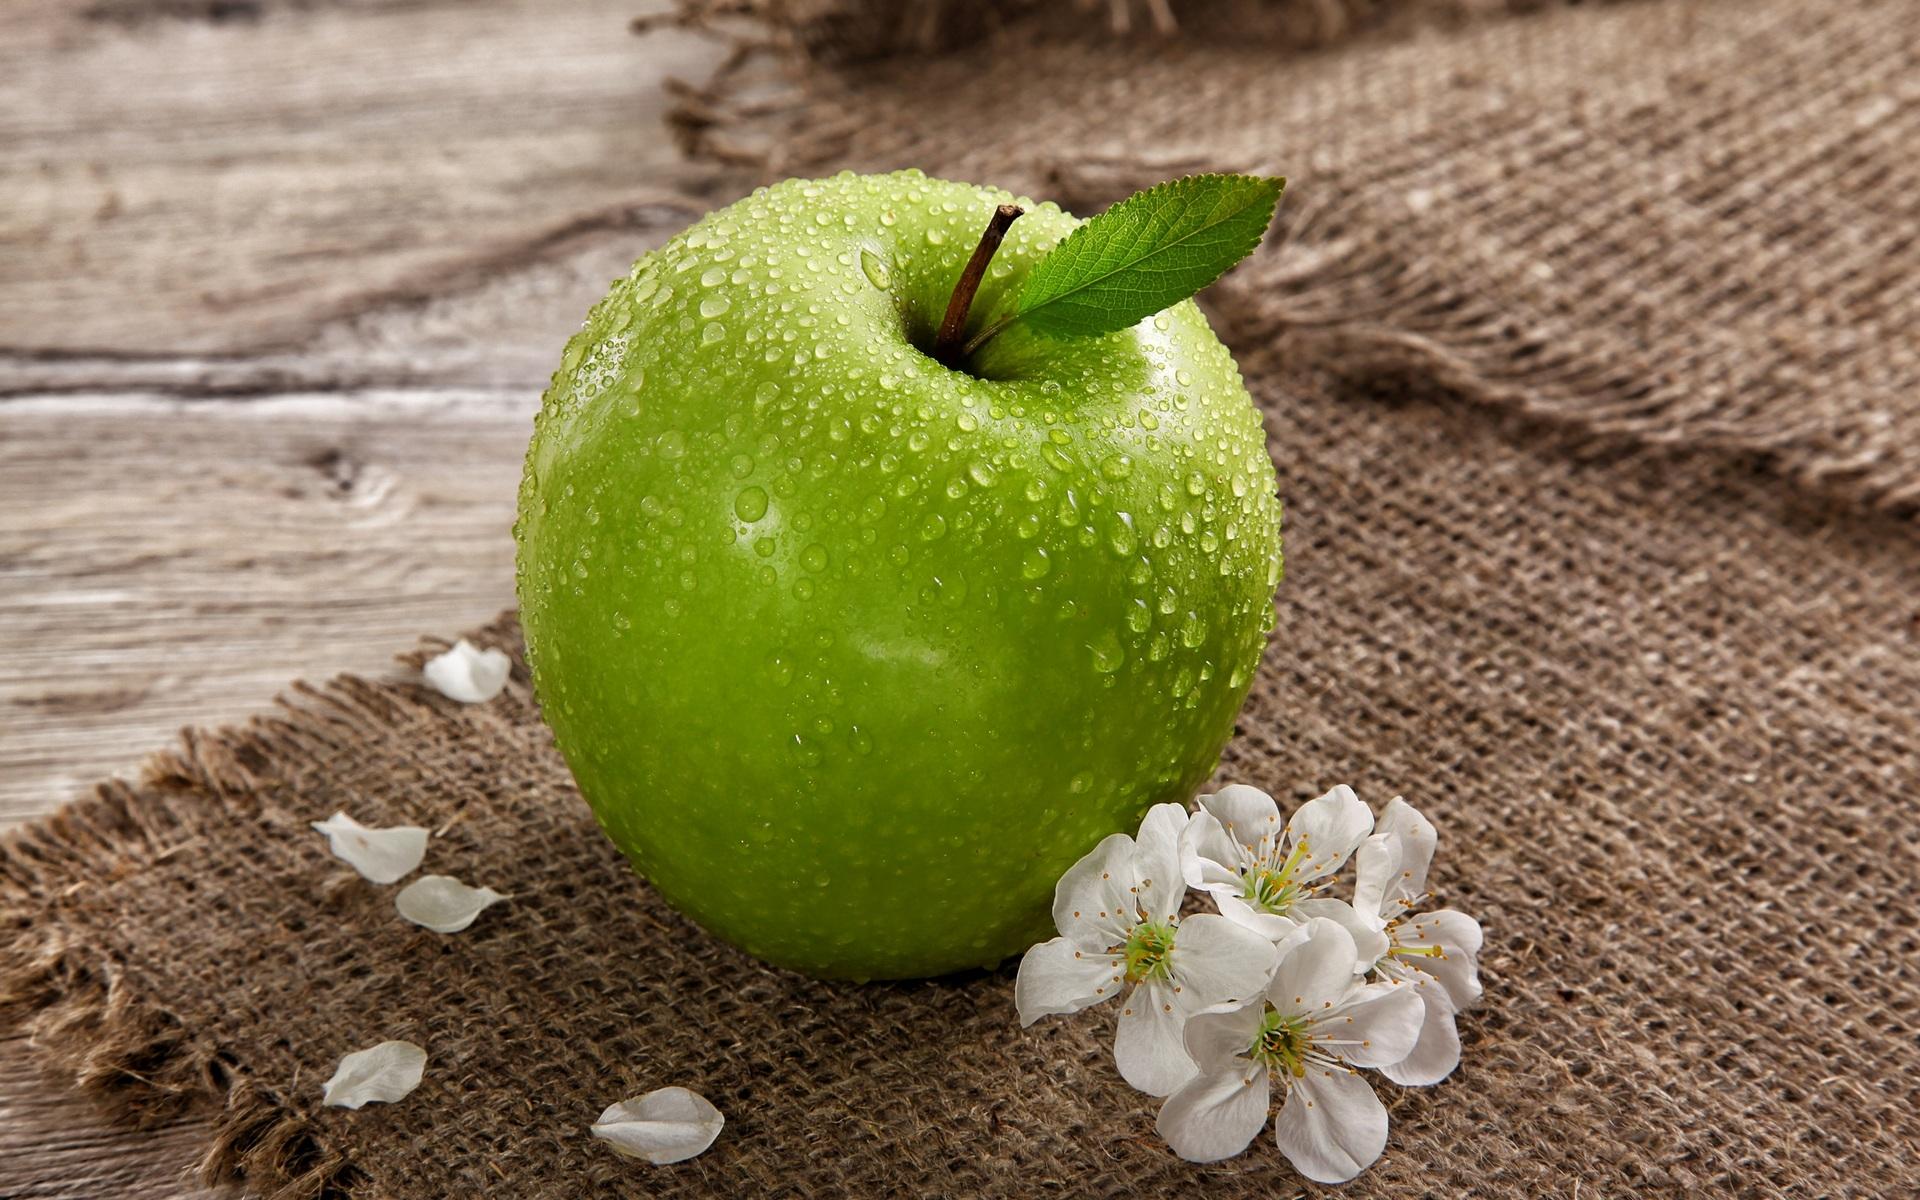 Обои с яблоками